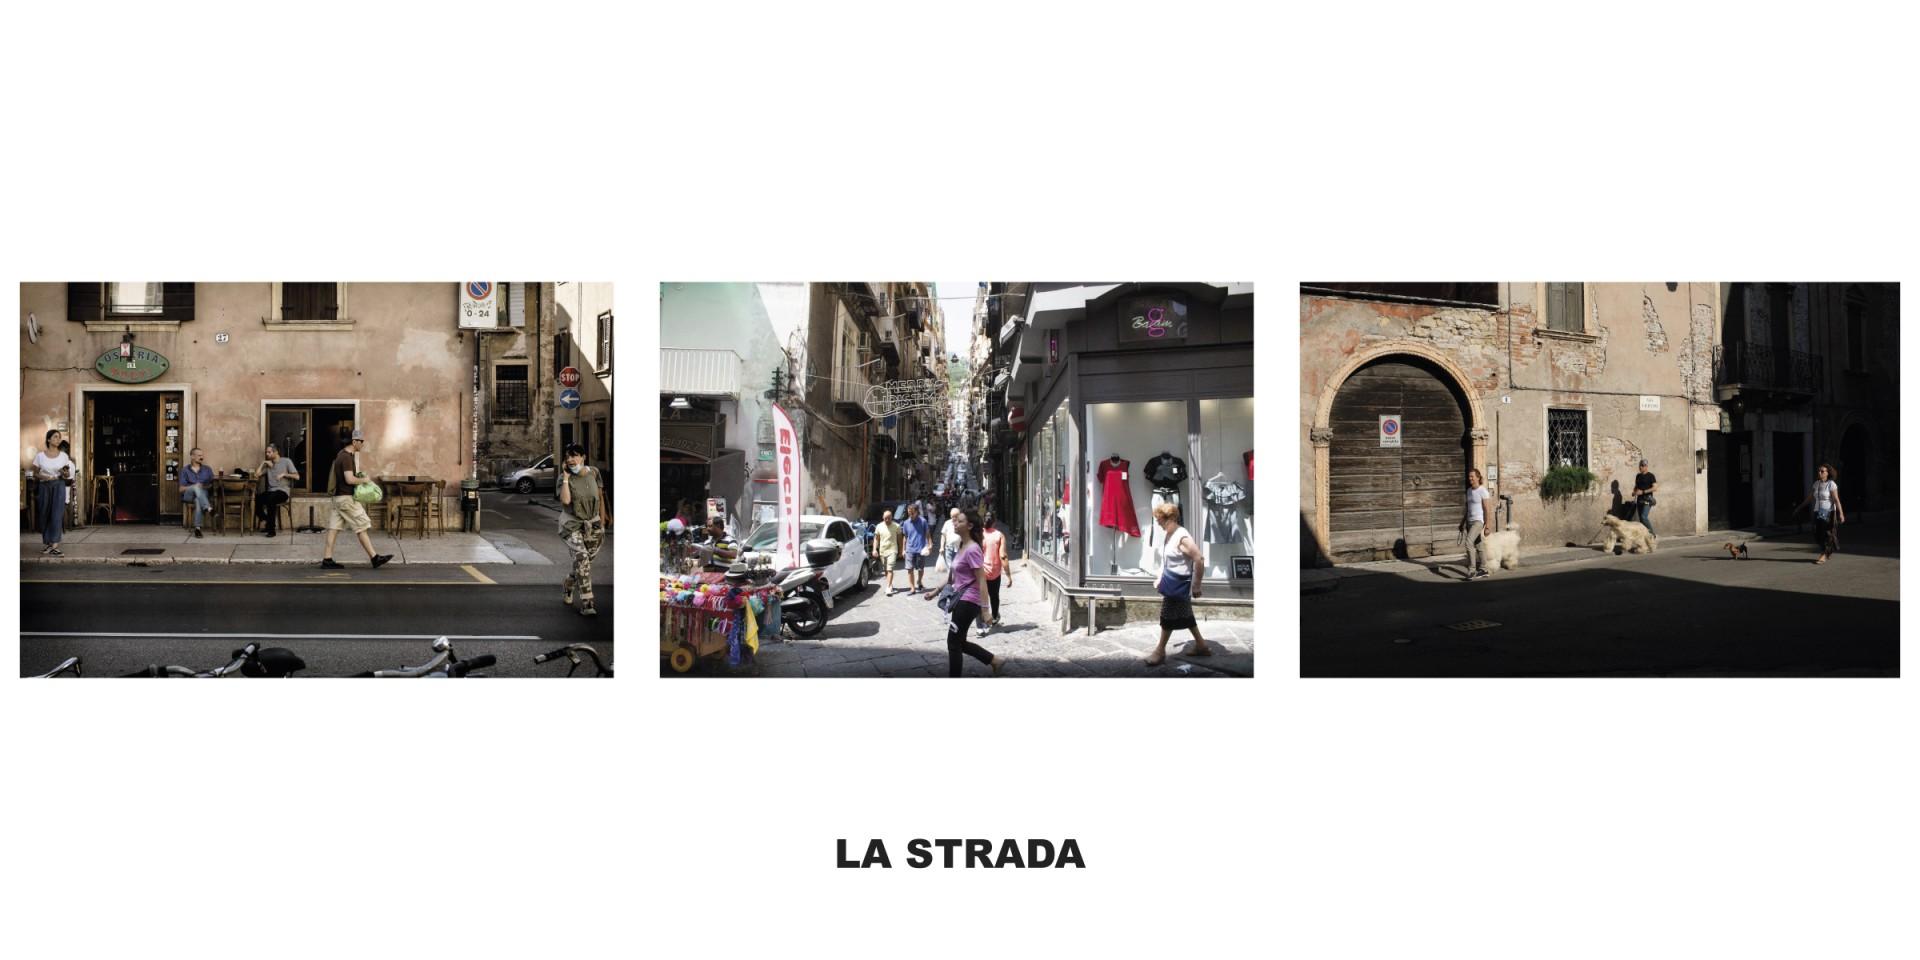 01-slide-la-strada-6.jpg